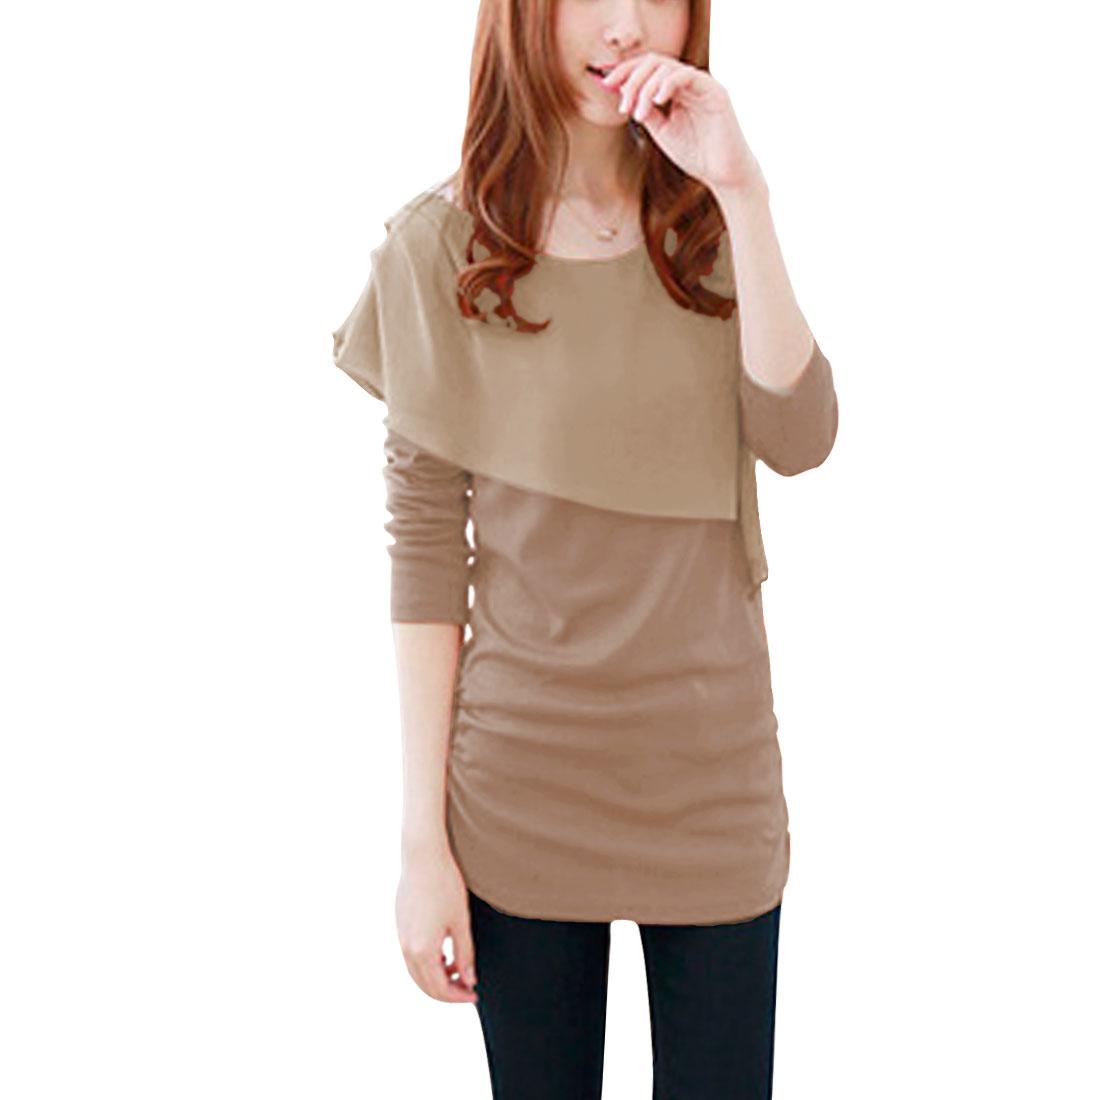 Lady Khaki Stretchy Pullover Chiffon Splice Long Sleeve Tunic Shirt XS